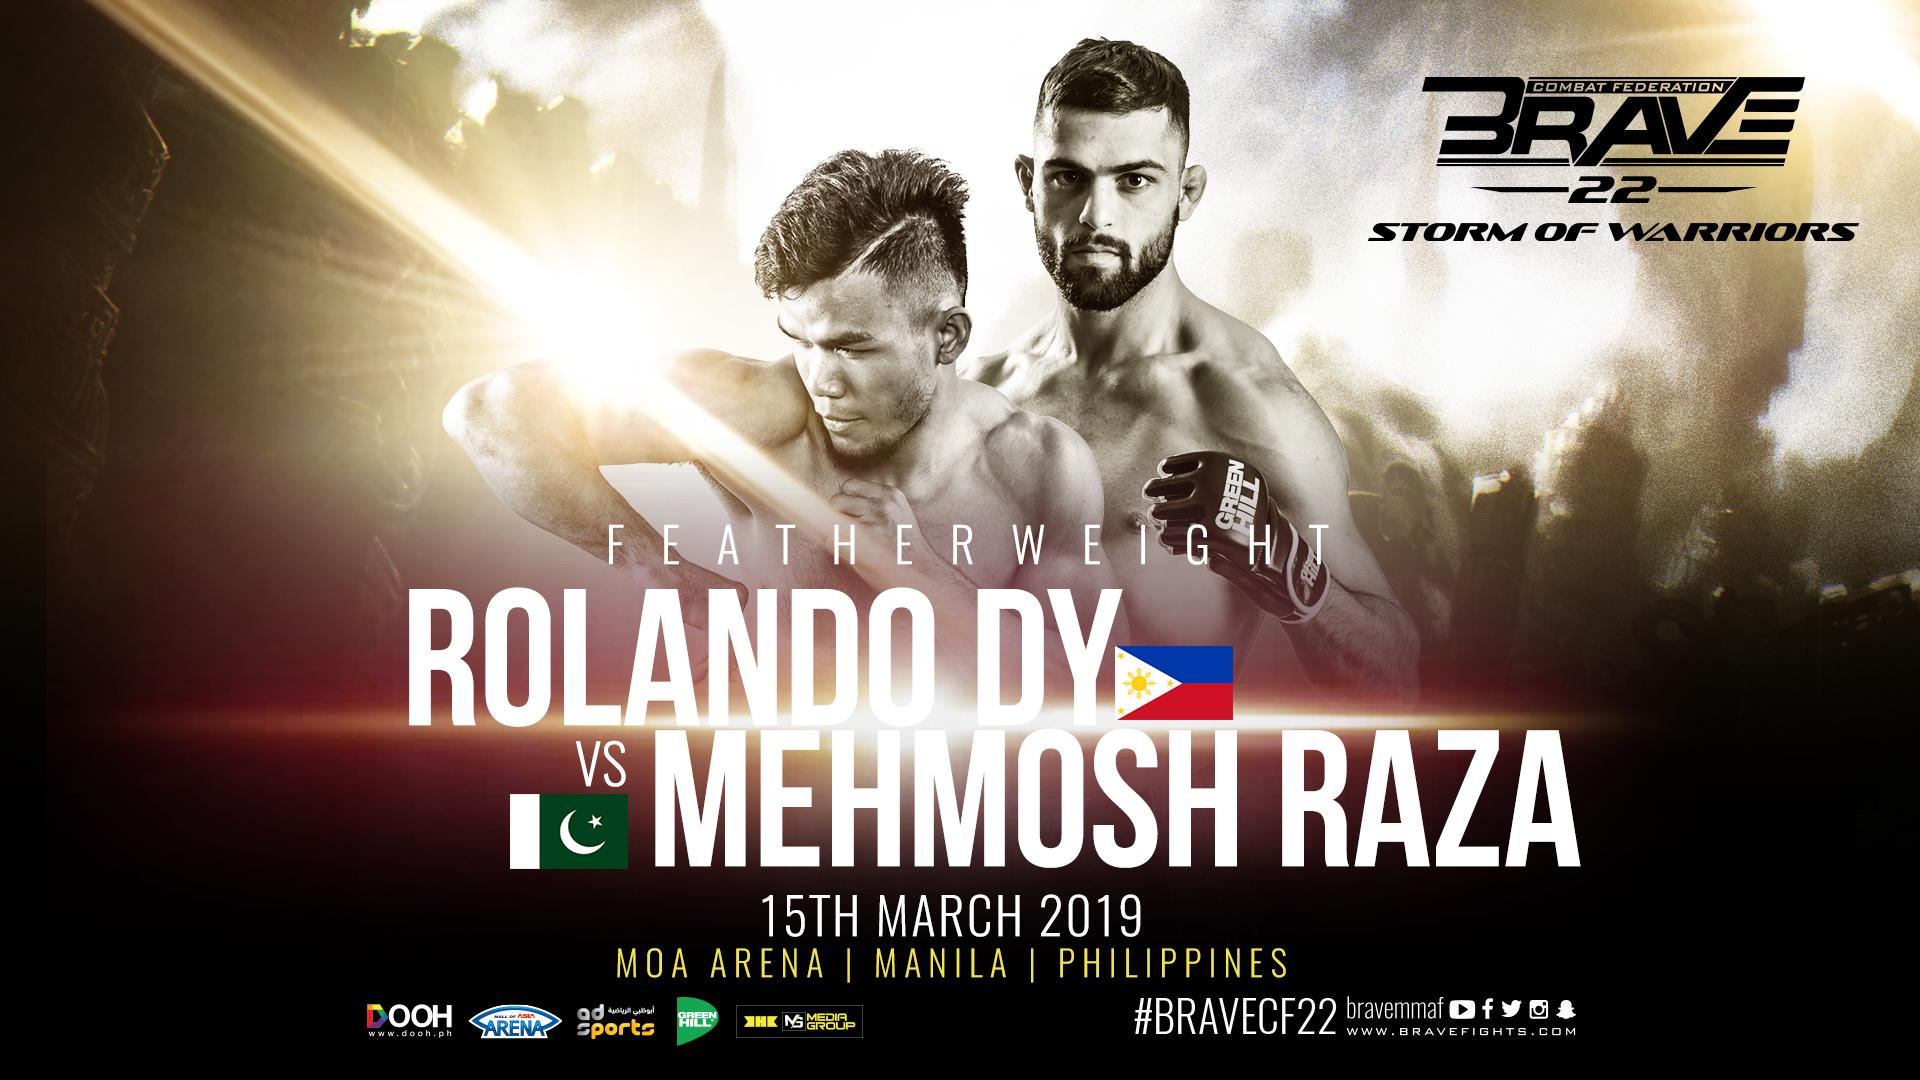 Brave 22: Rolando Dy returns home for bout against Mehmosh Raza -